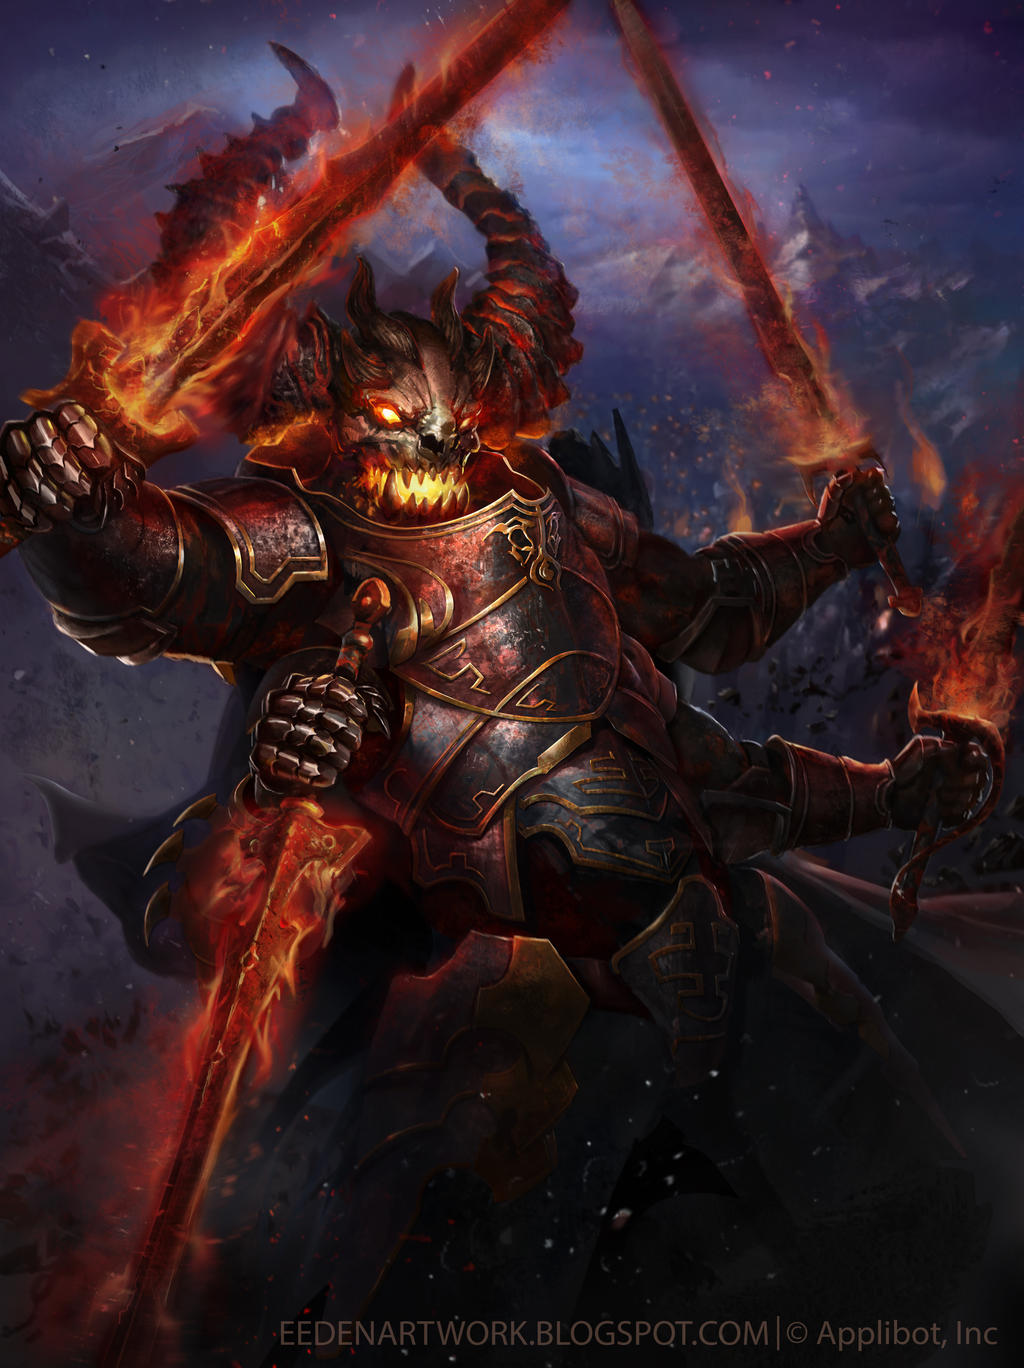 Demon Level 1 3000x4000 jpg final by Eedenartwork